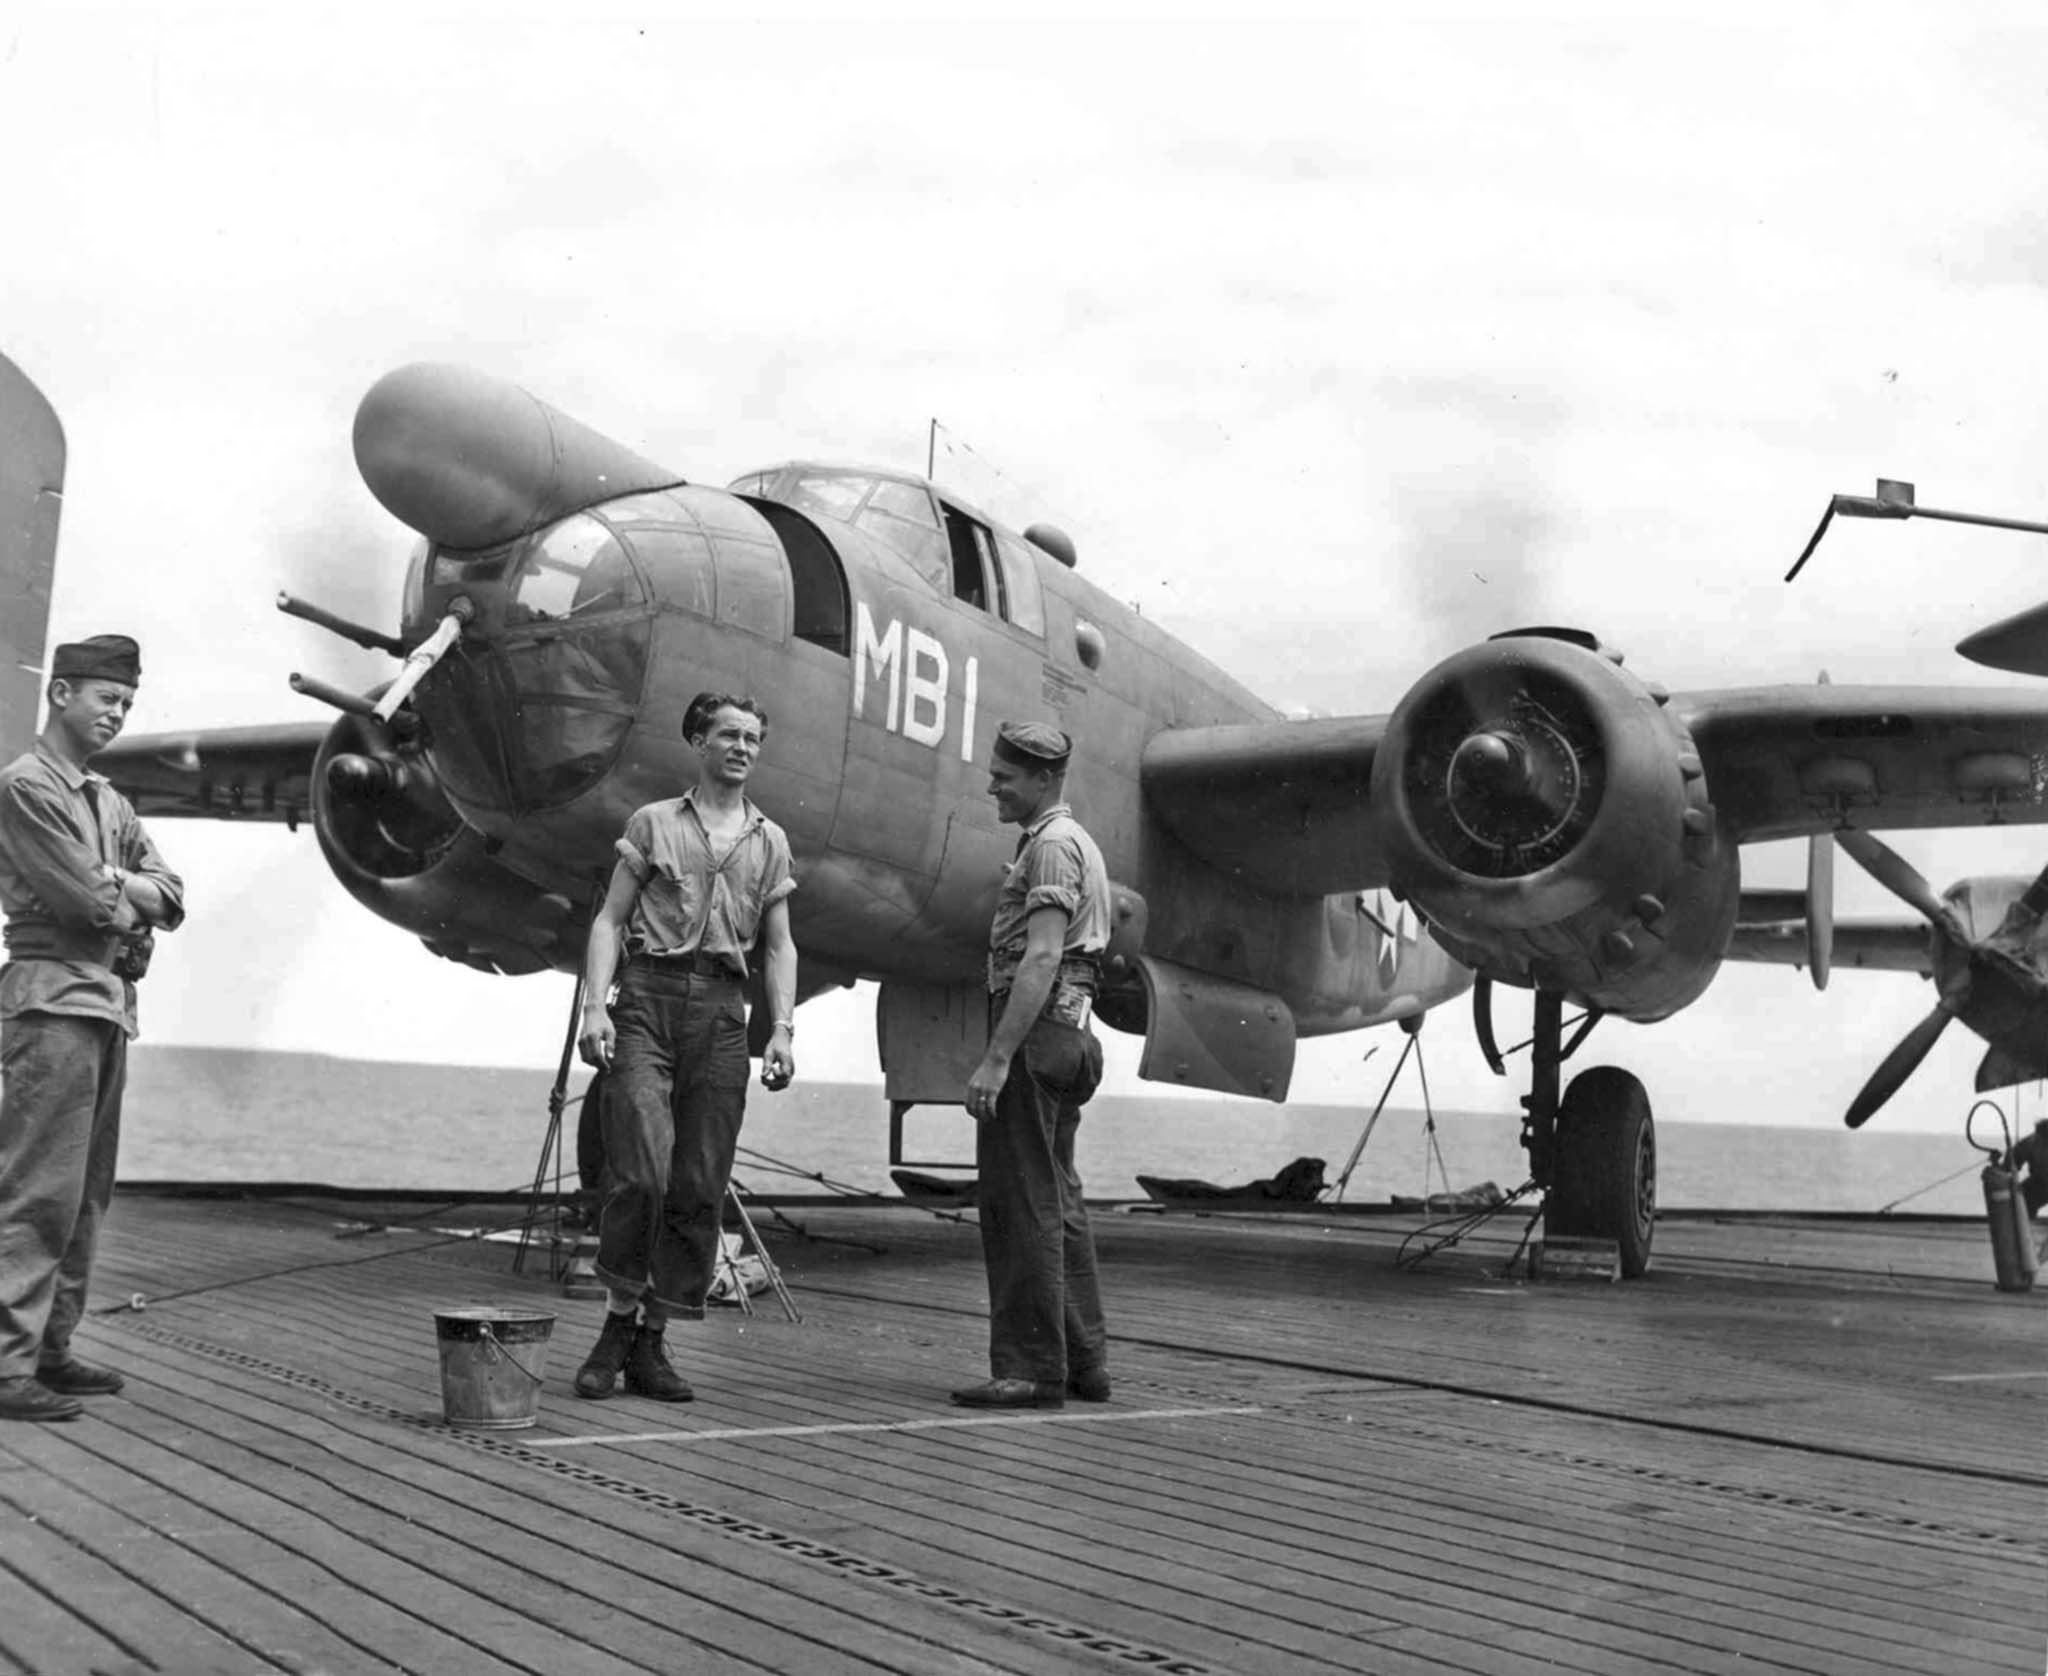 PBJ-1D Mitchell